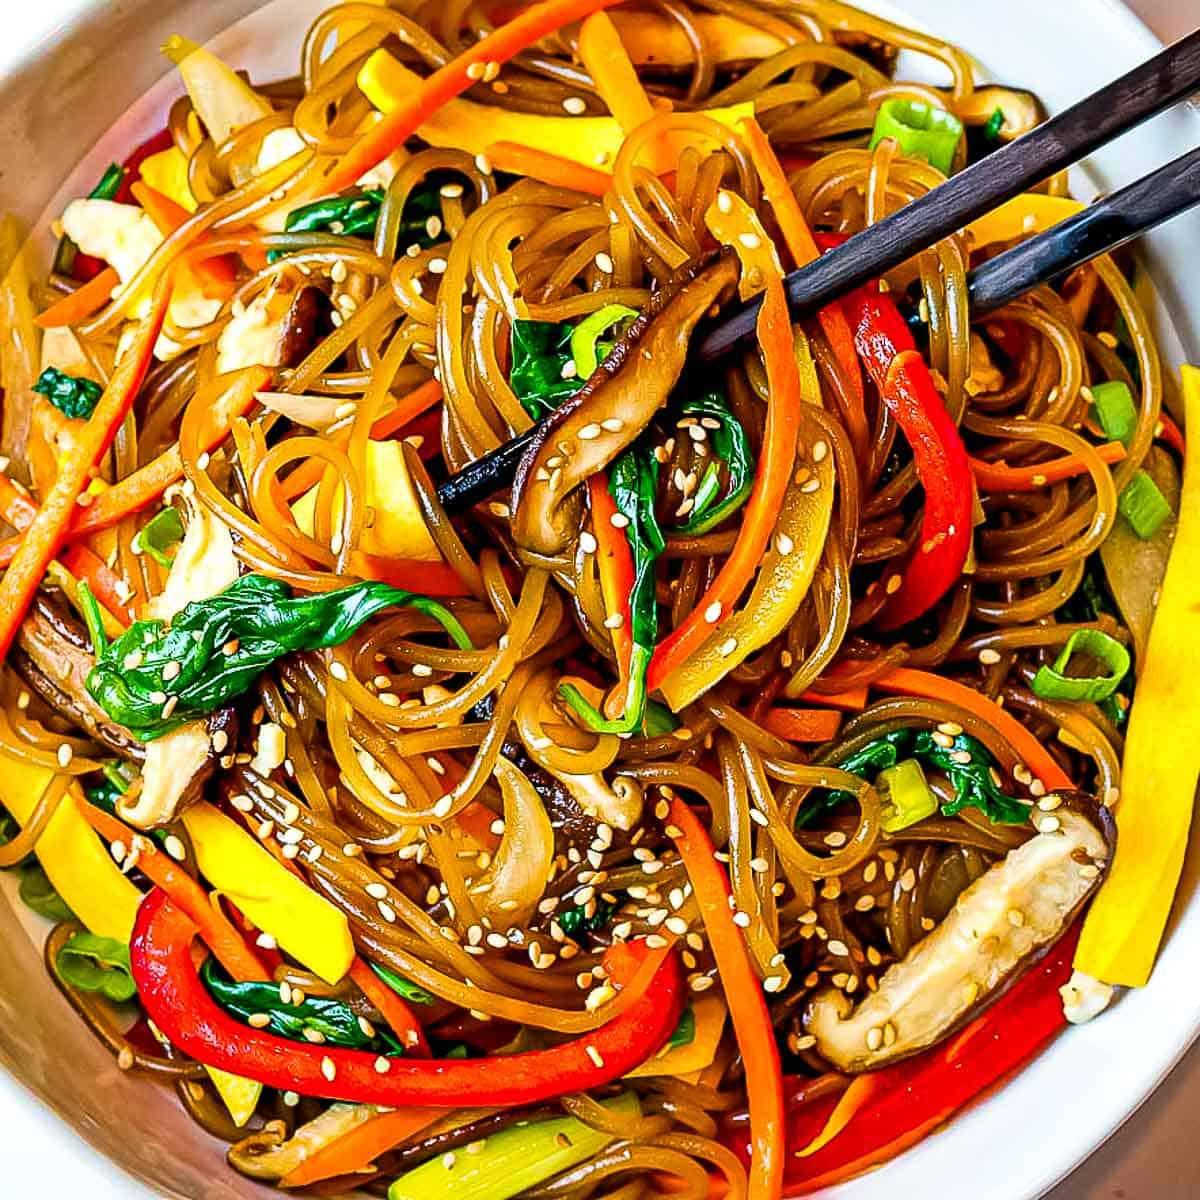 recipe of japchae Easy Japchae (Korean glass noodle stir fry)